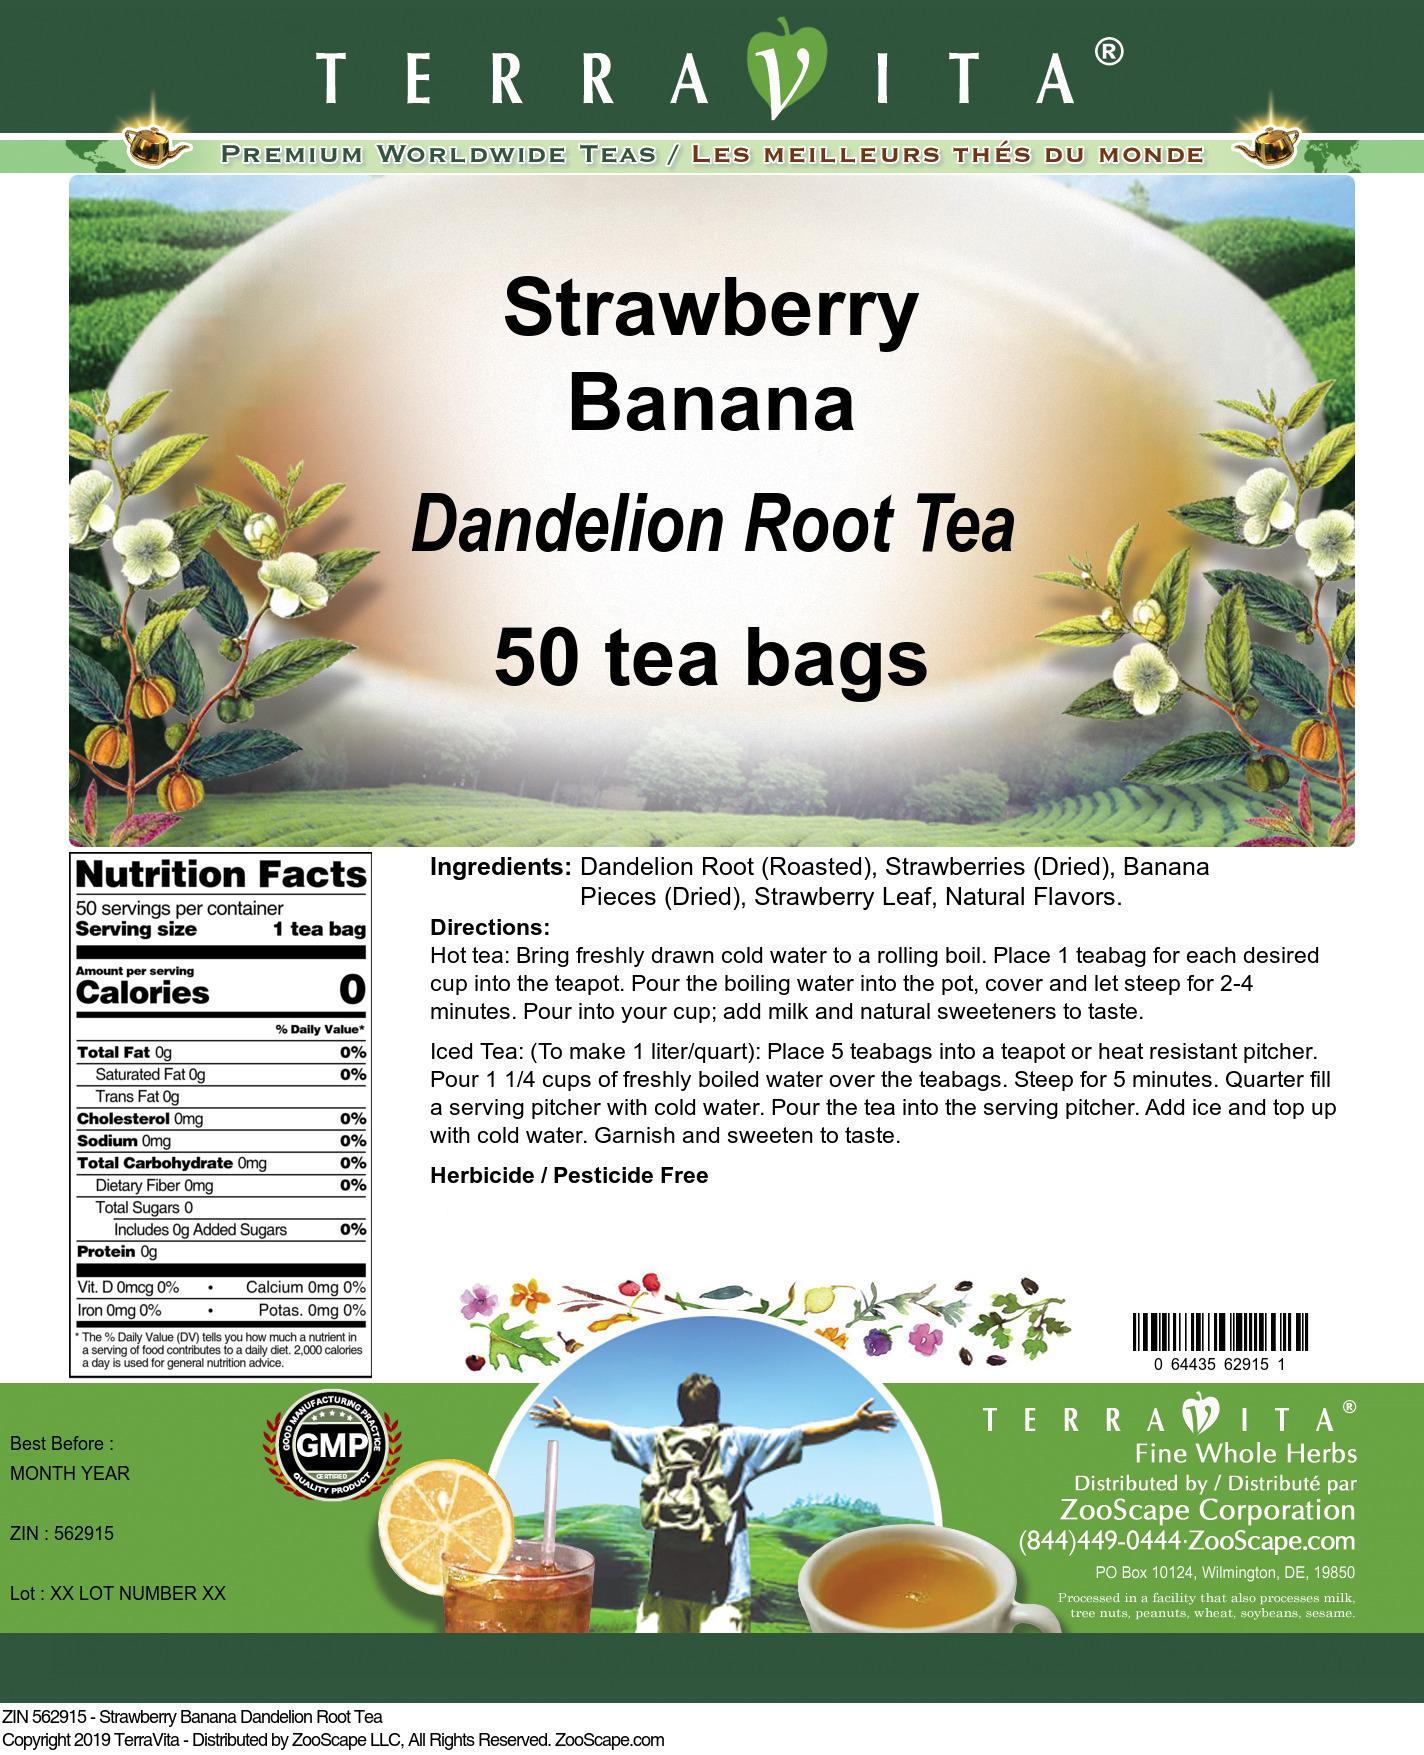 Strawberry Banana Dandelion Root